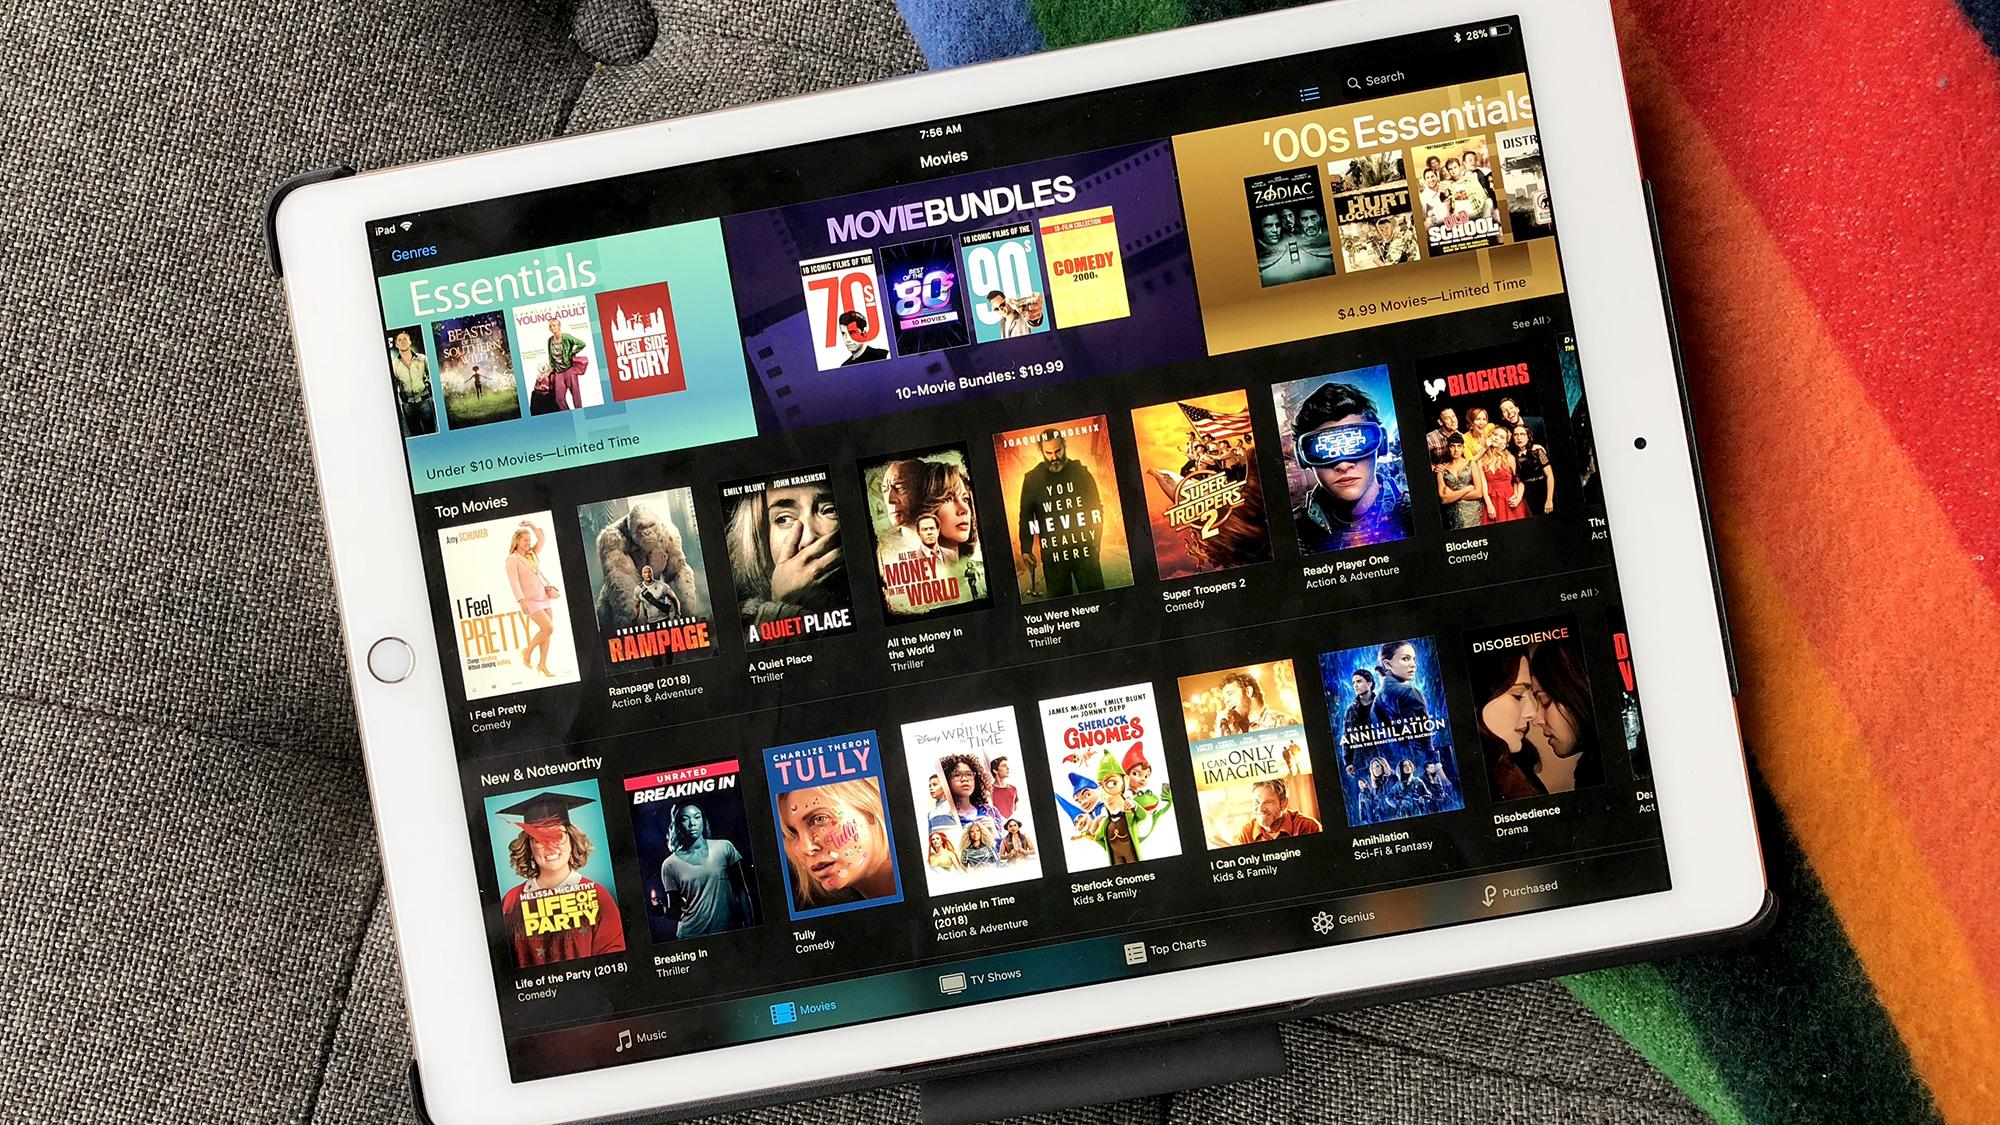 iTunes launches massive movie sale: 10-film bundles $20, $5 essentials, much more